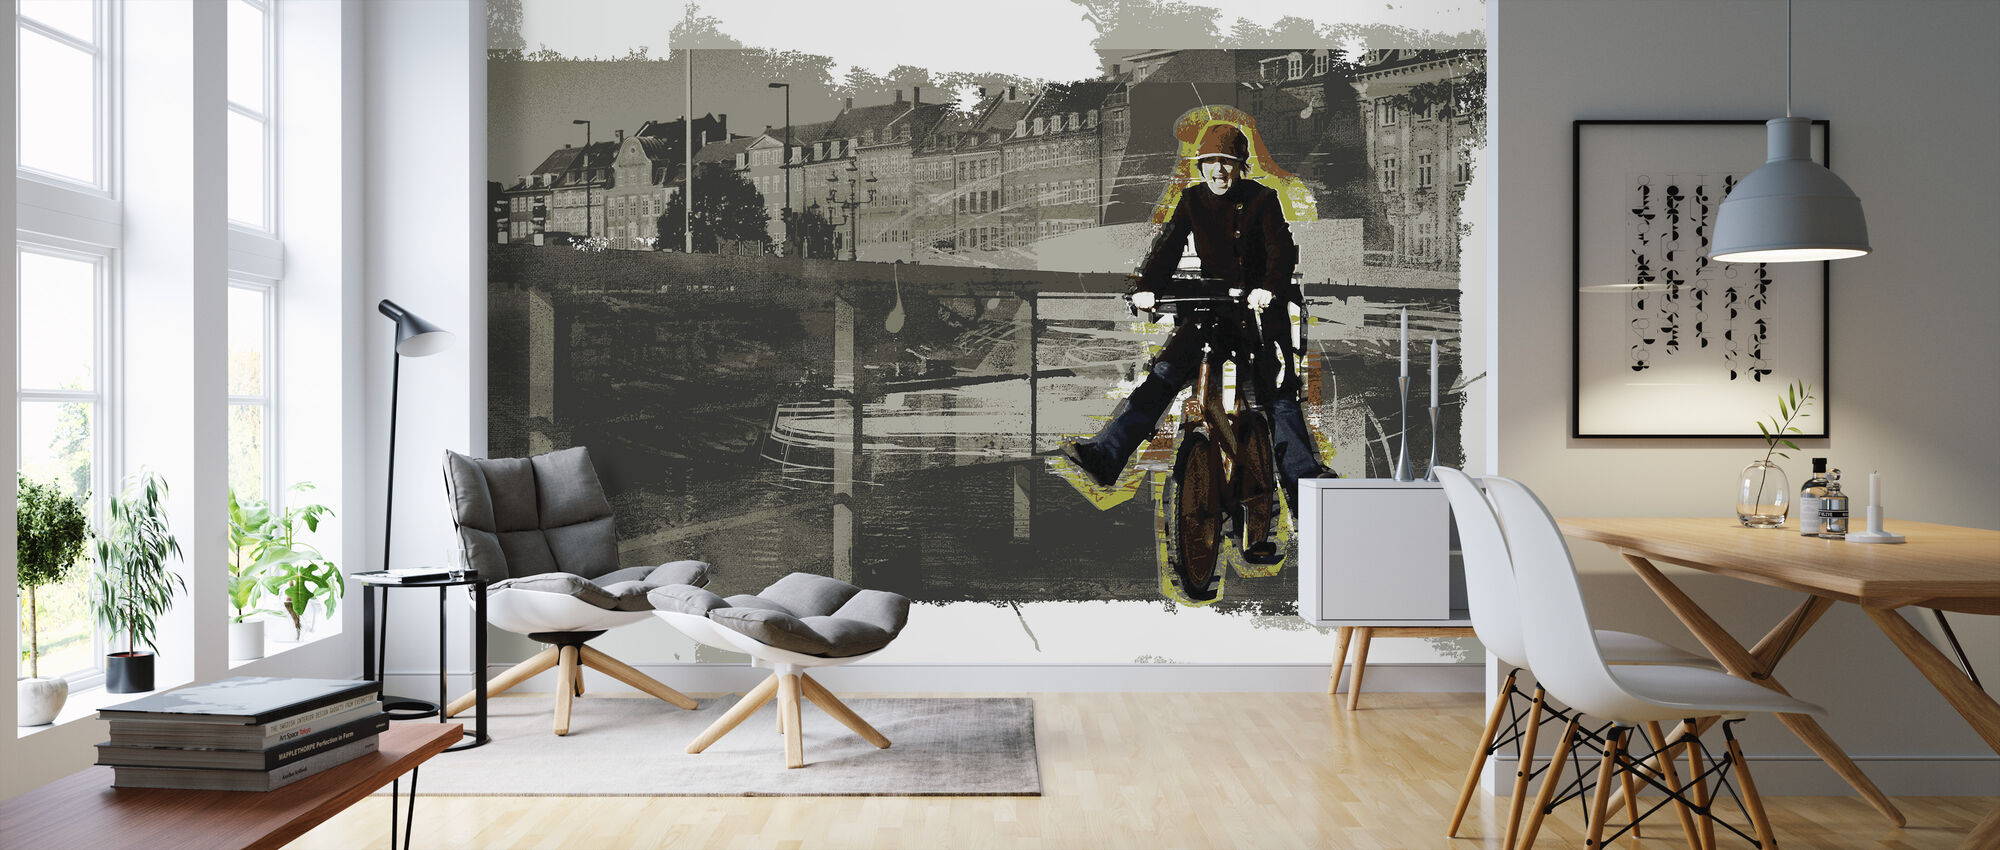 Copenhagen - Wallpaper - Living Room